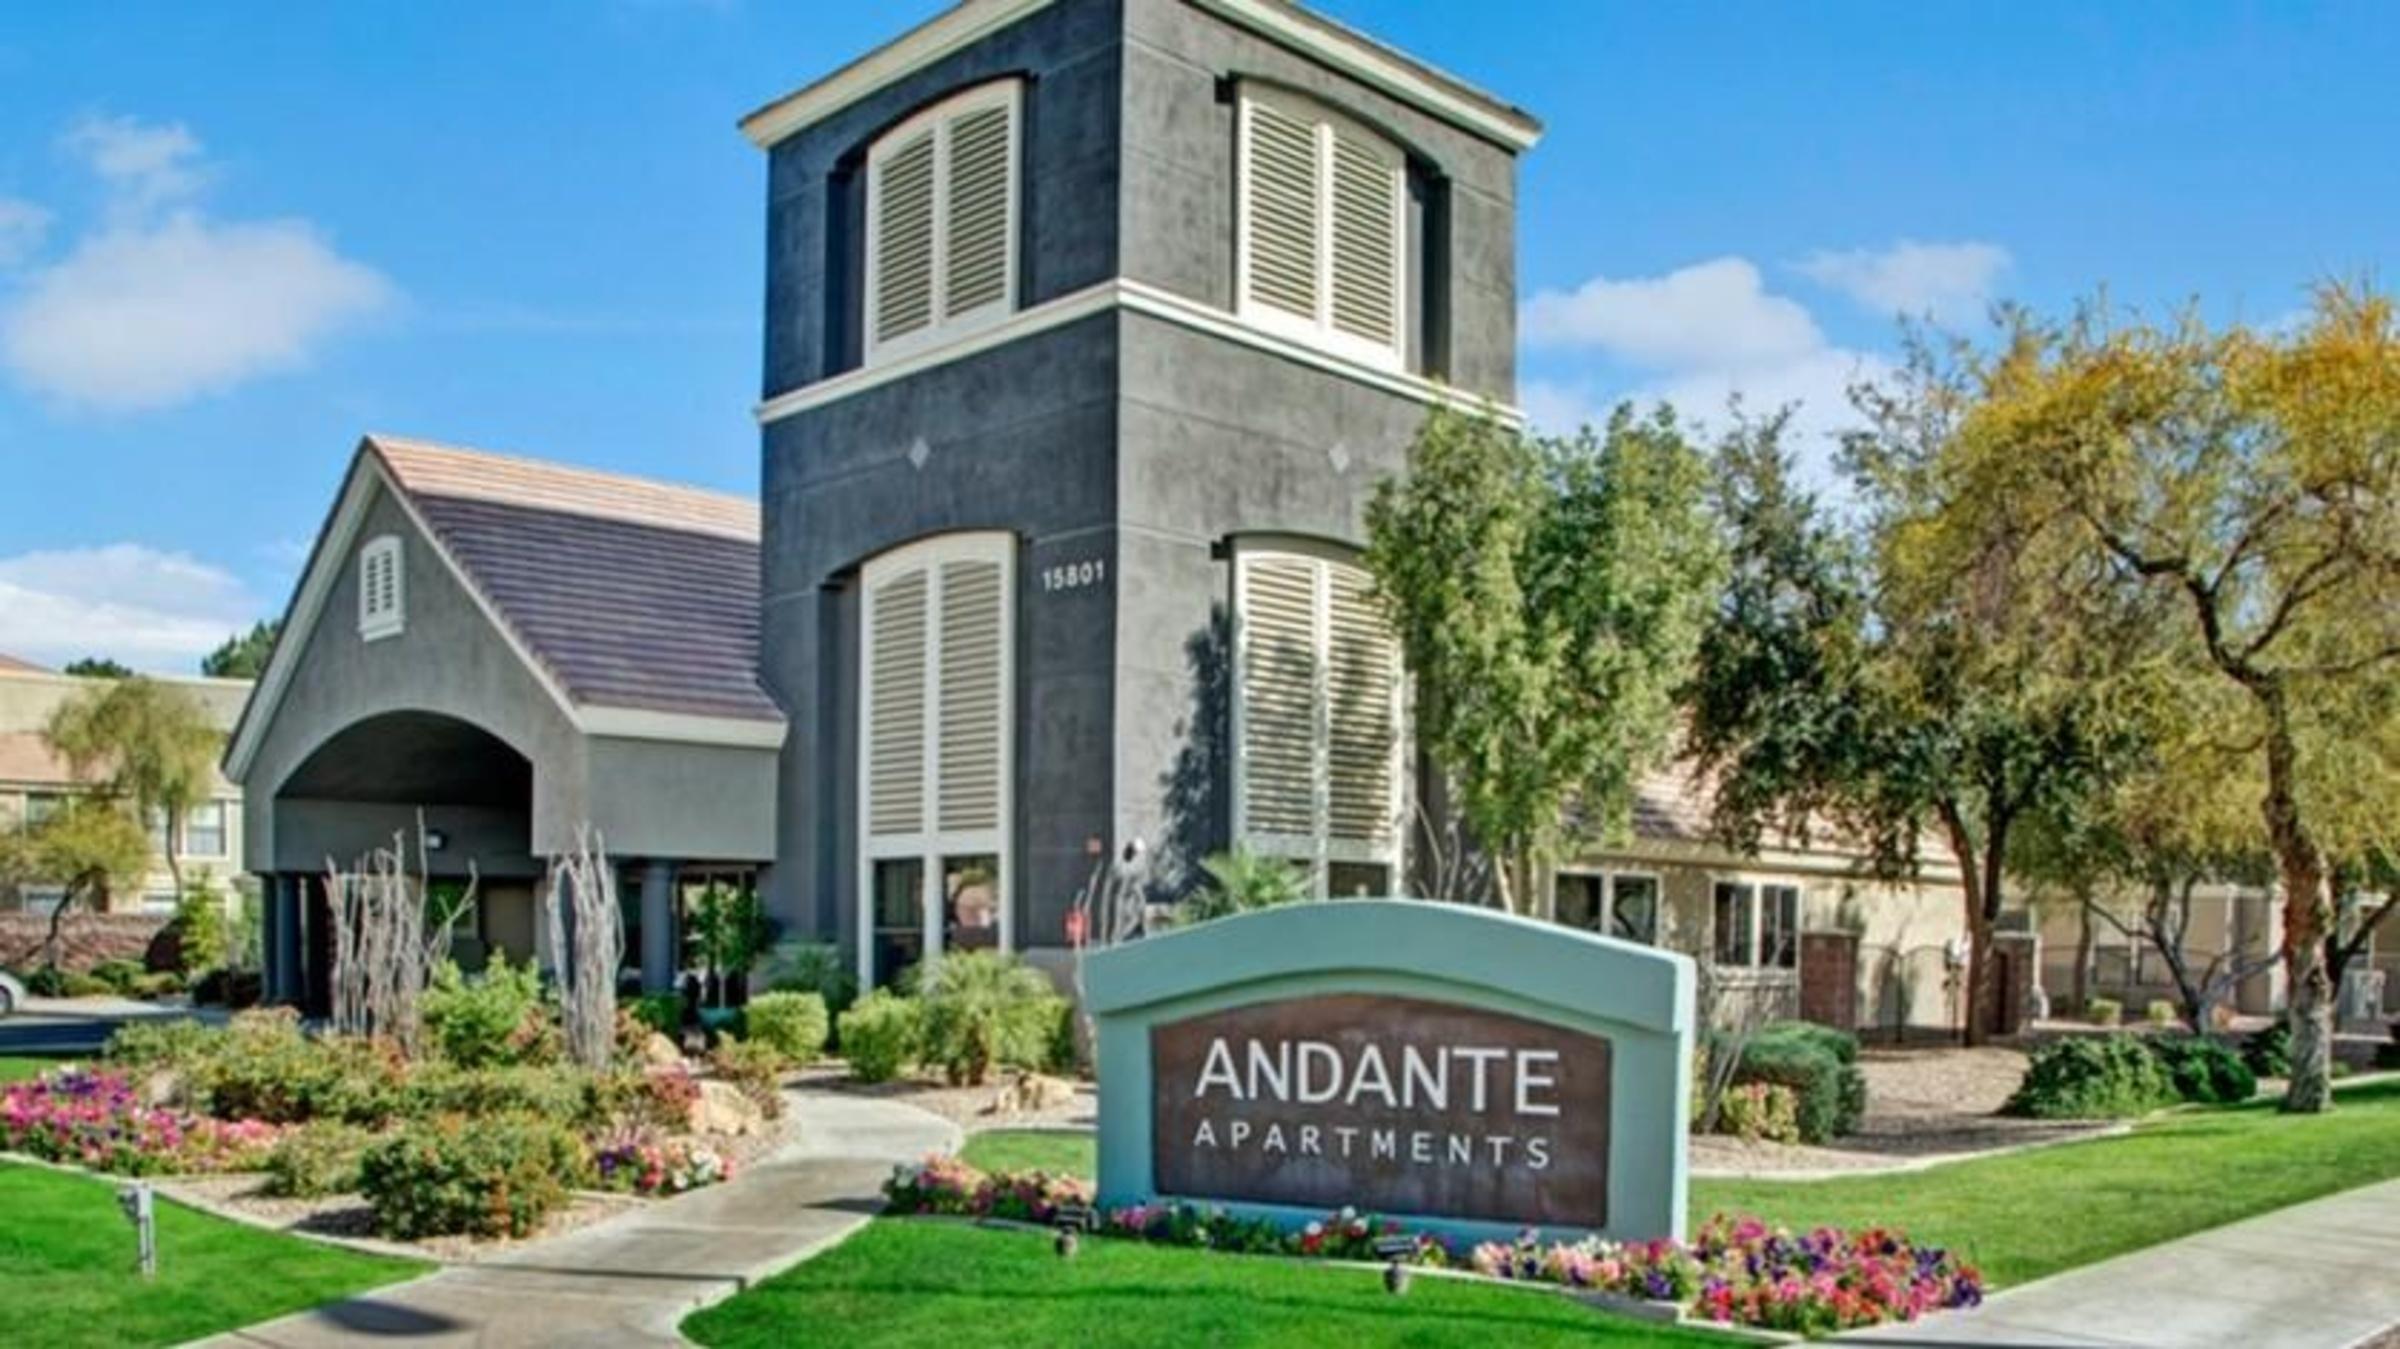 Andante Apartments 2199